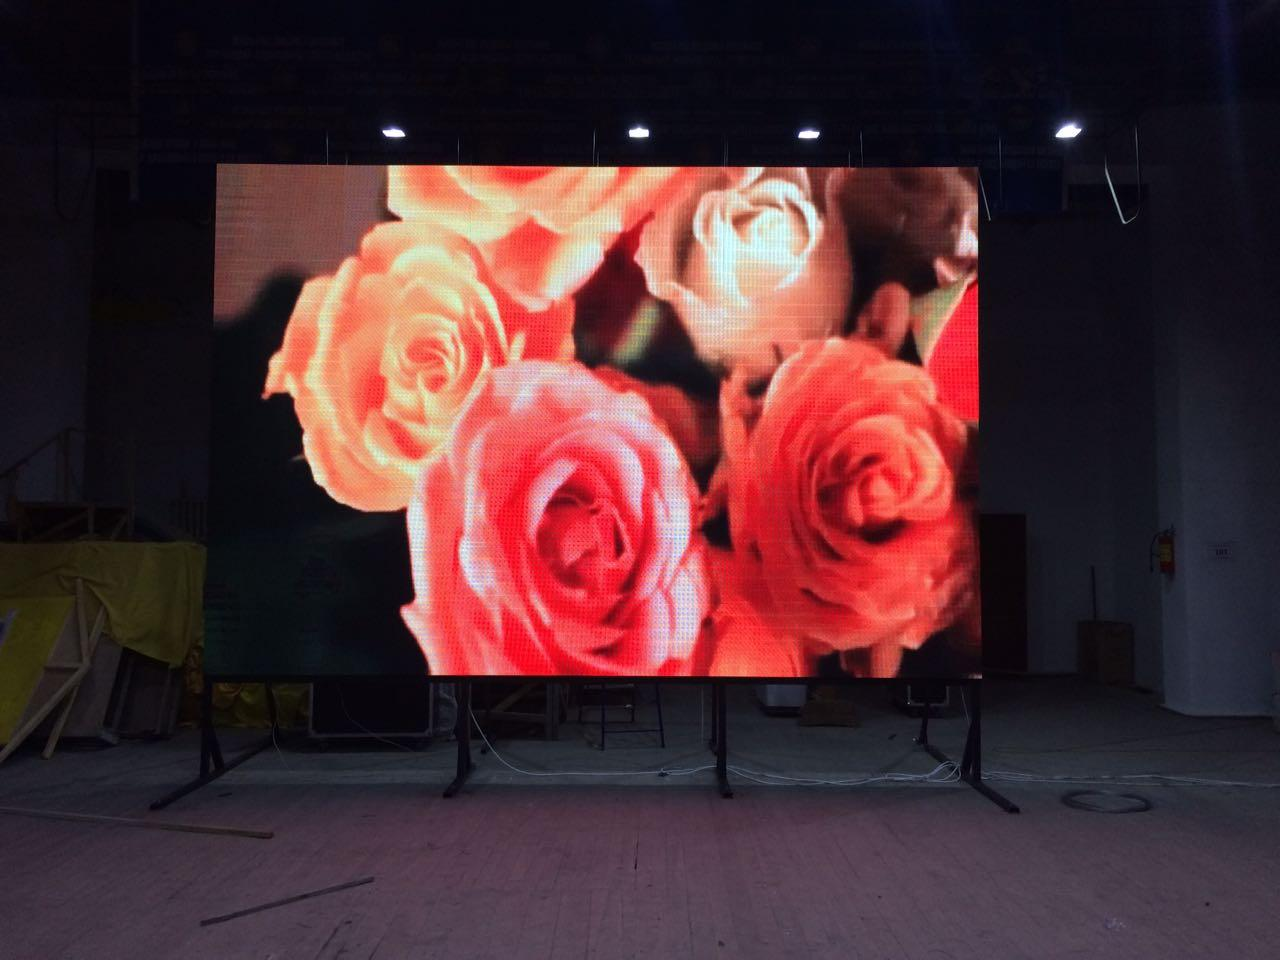 Лед экран Р5 SMD